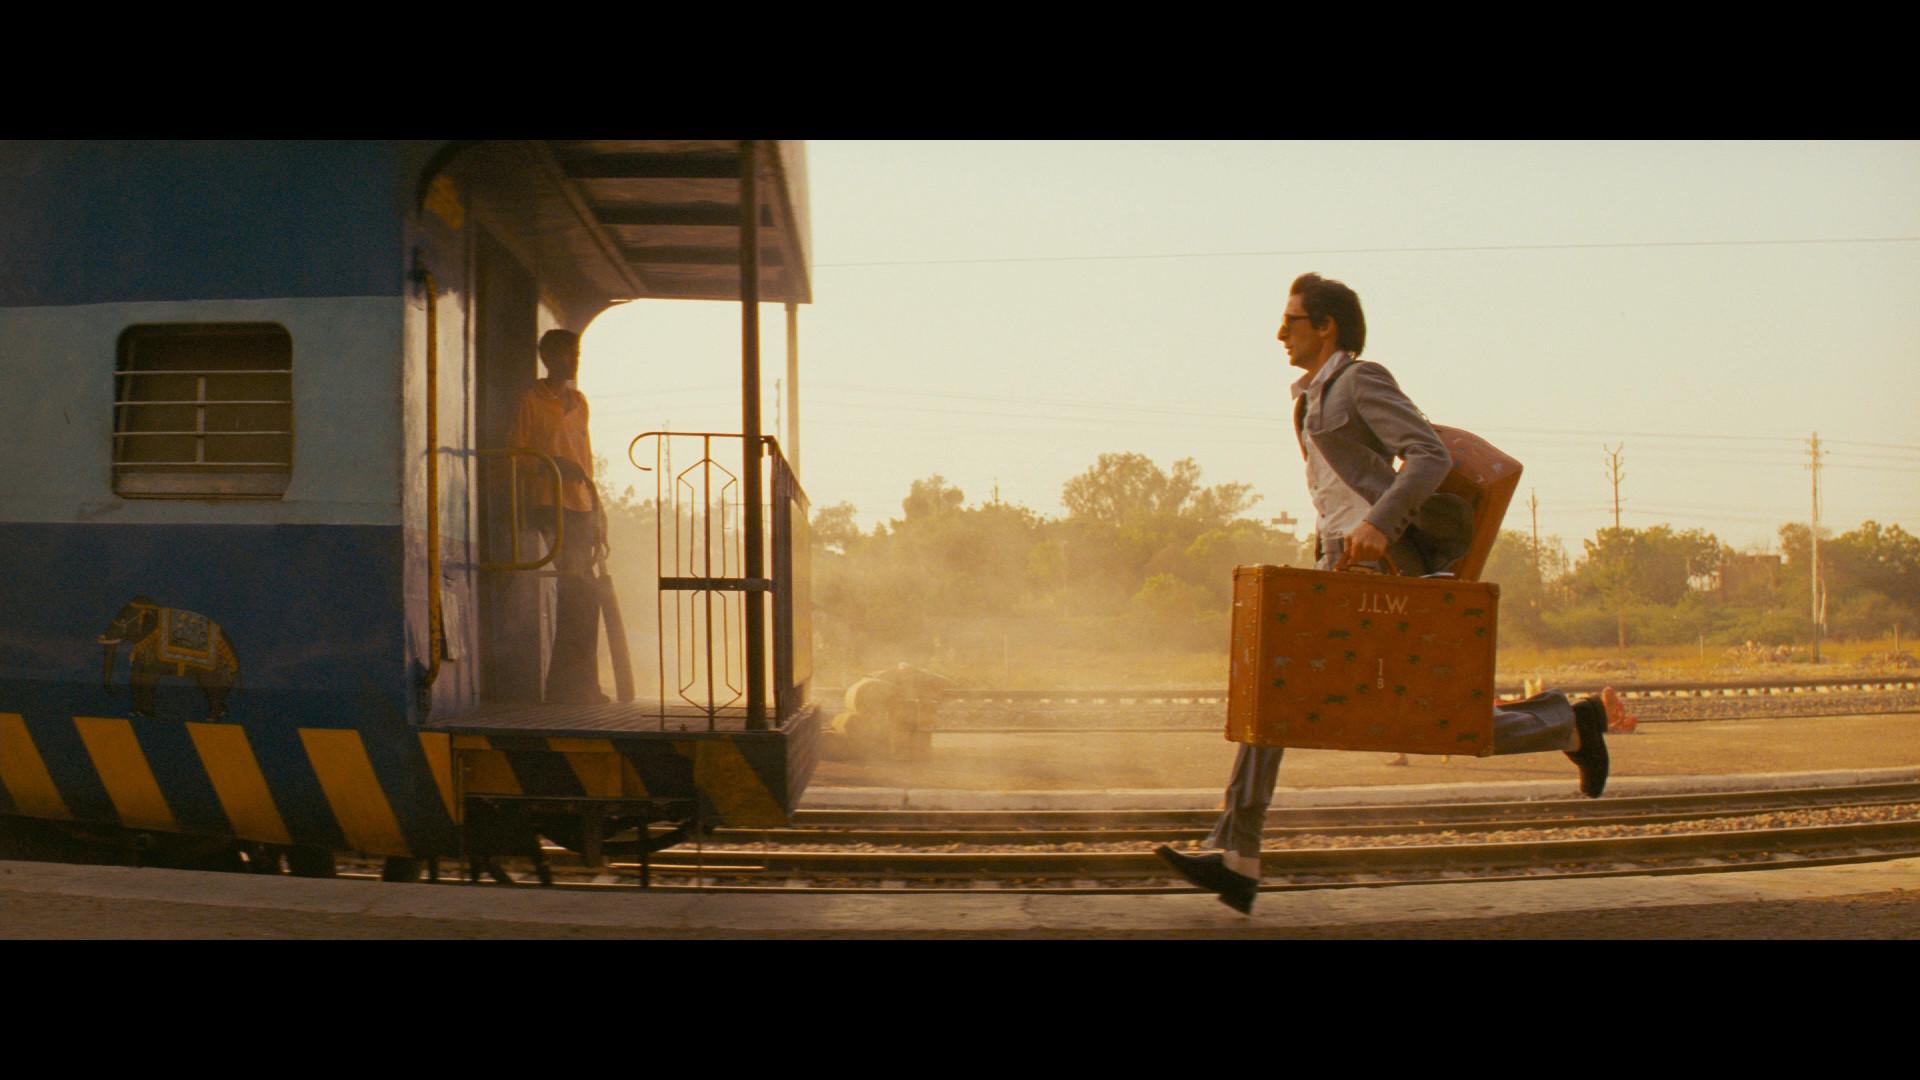 The Darjeeling Limited (2007, dir. Wes Anderson) | films you